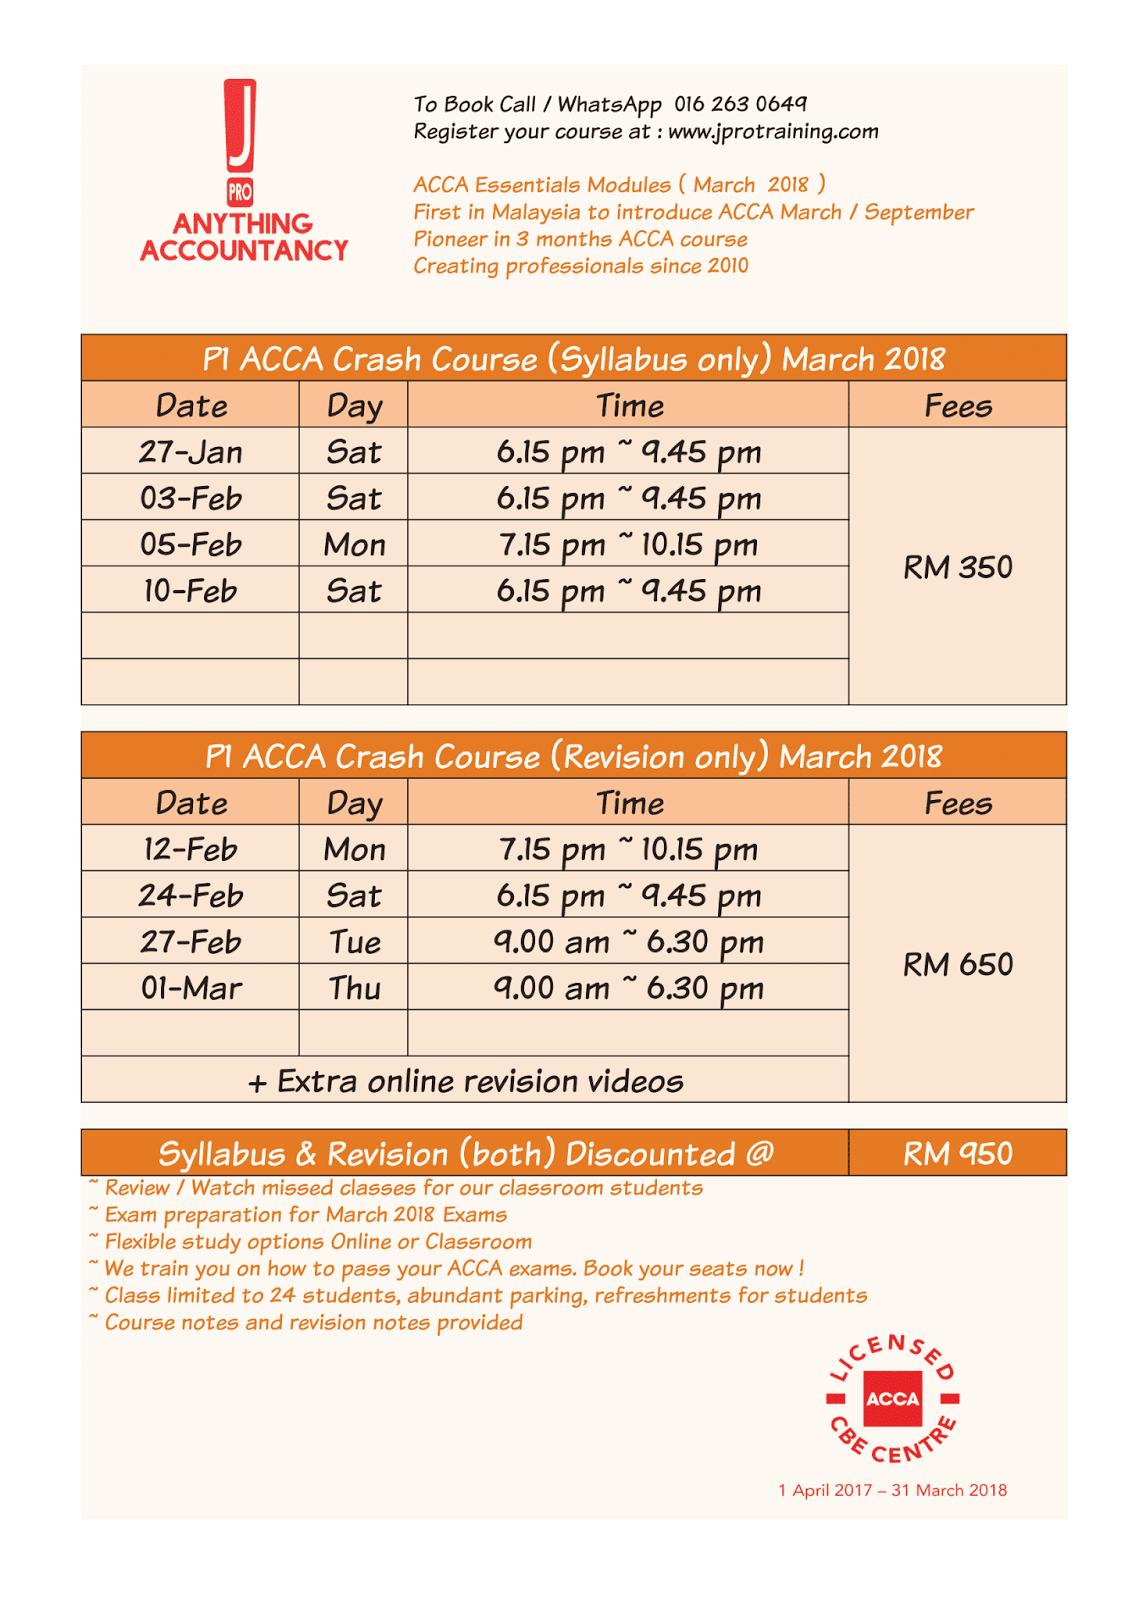 J Pro Business Training: March 2018 Exam Preparation Timetable